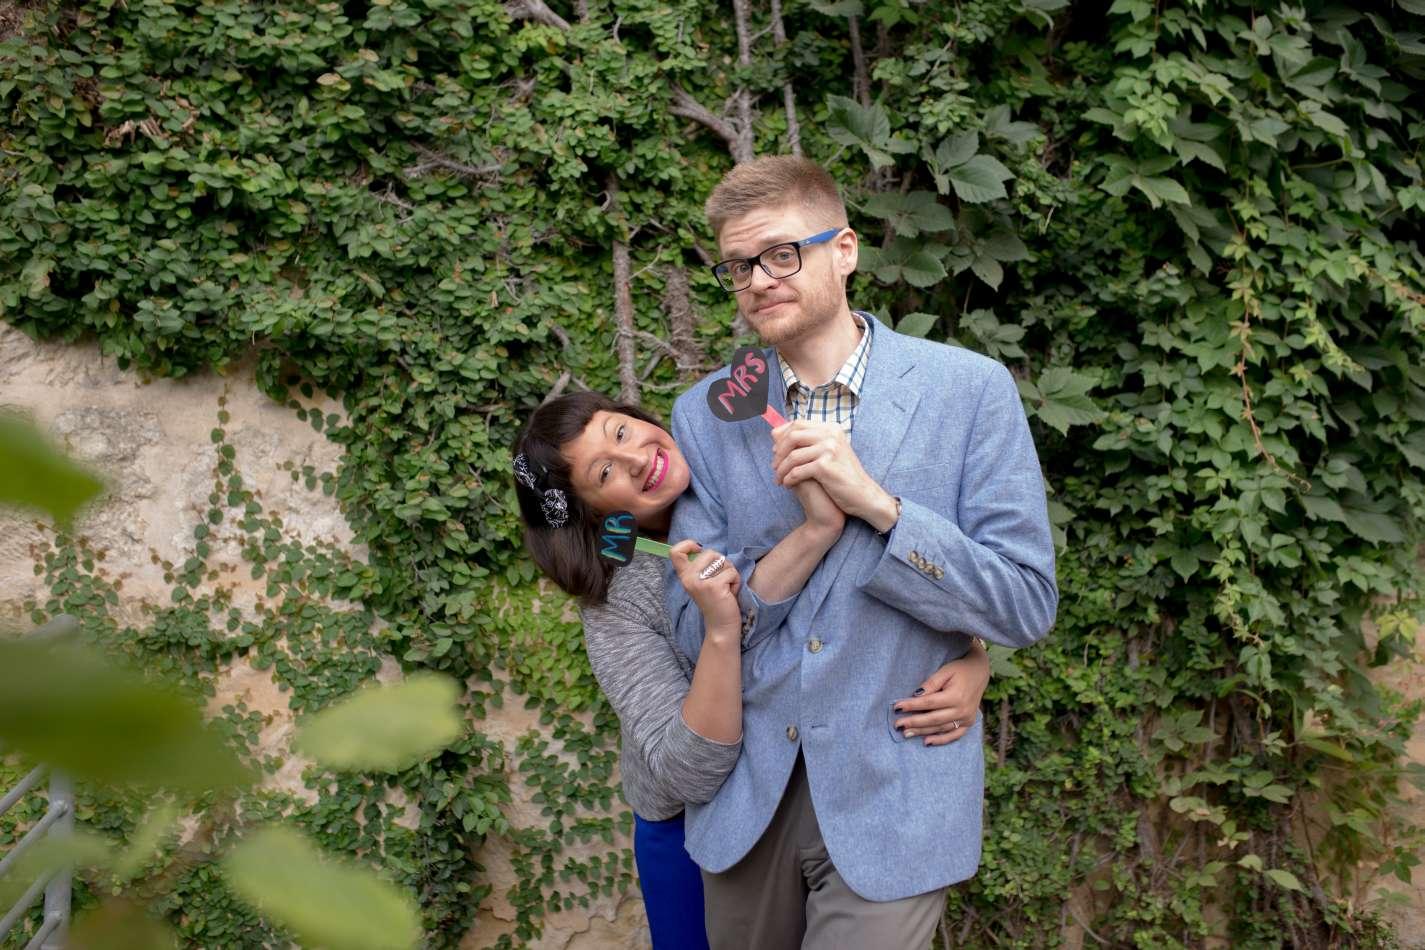 HighDot Studios - Sarah and Zach - Engagement Session - San Antonio - Riverwalk - San Antonio Zoo (4)